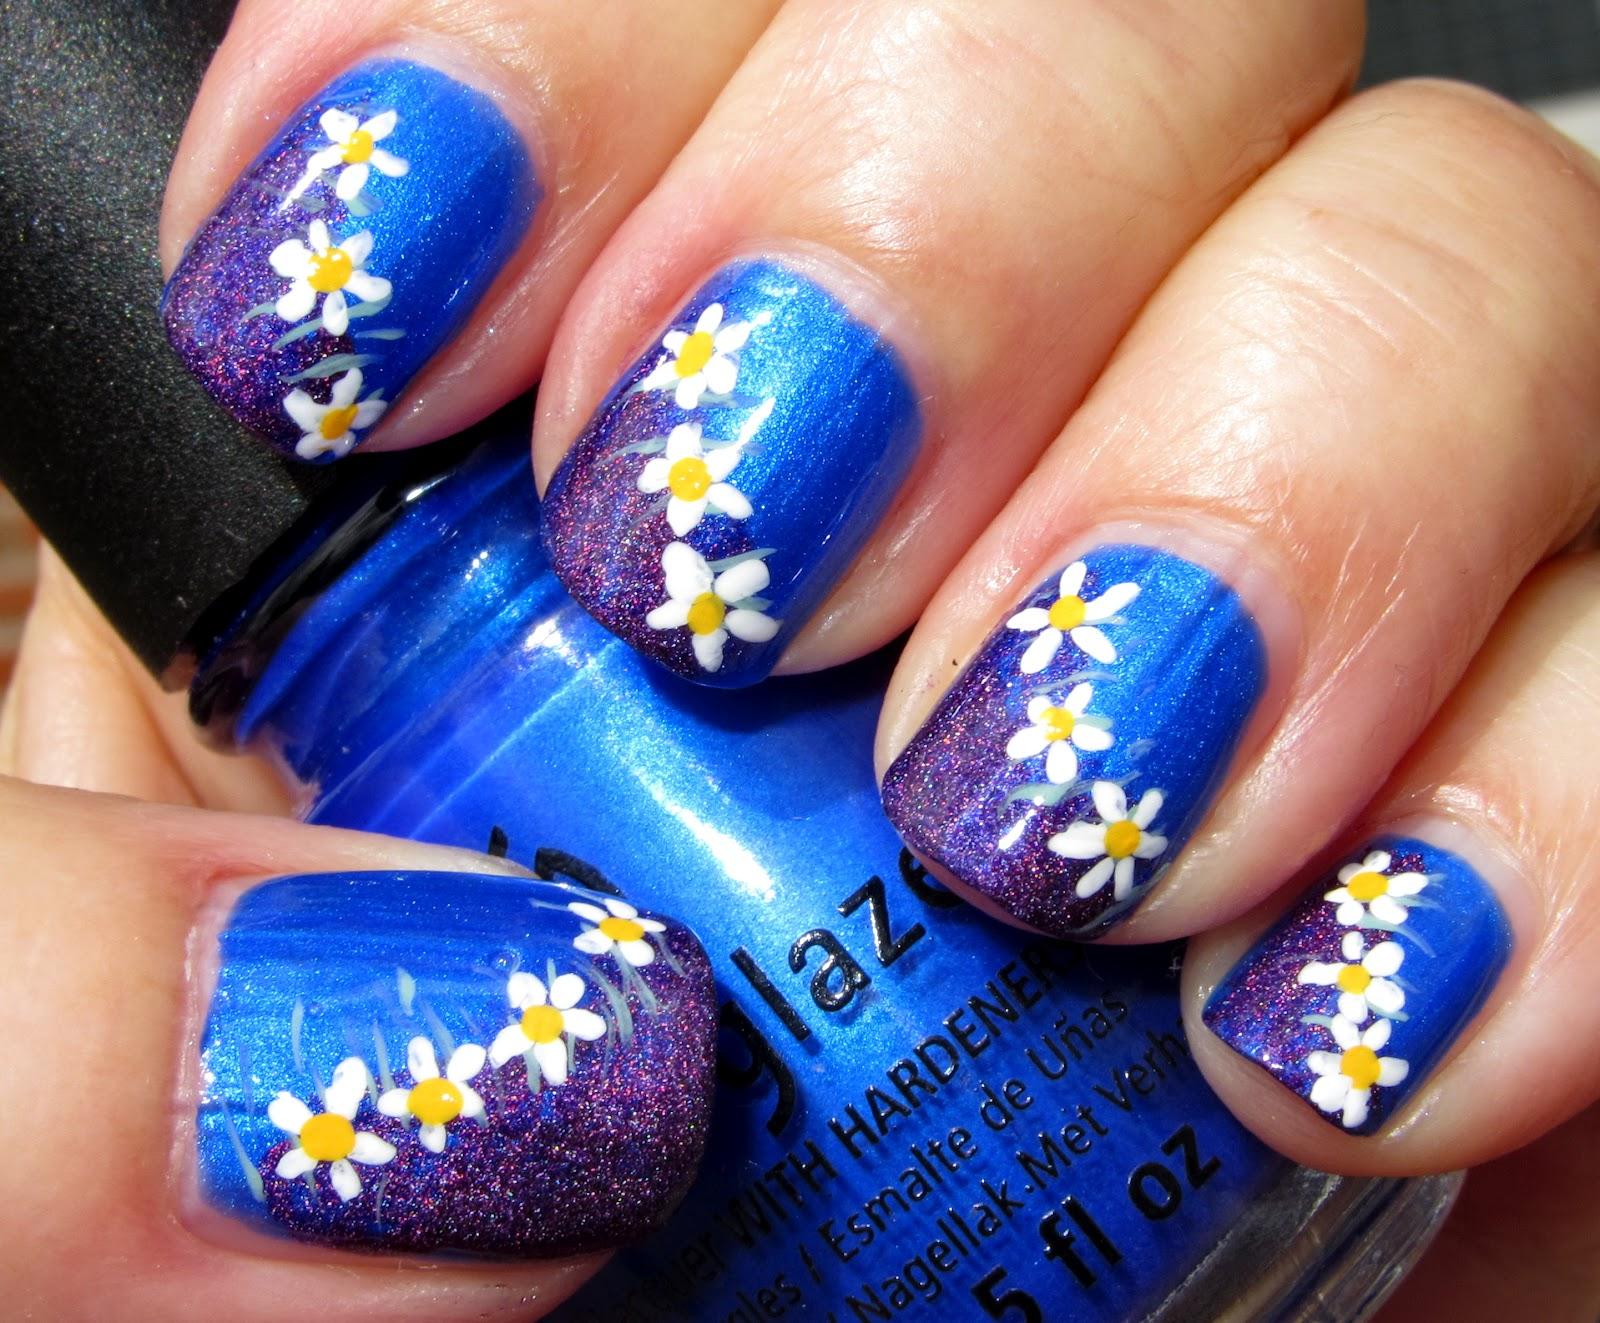 Crazy Nail Designs Colorful 2015 Best Nails Design Ideas